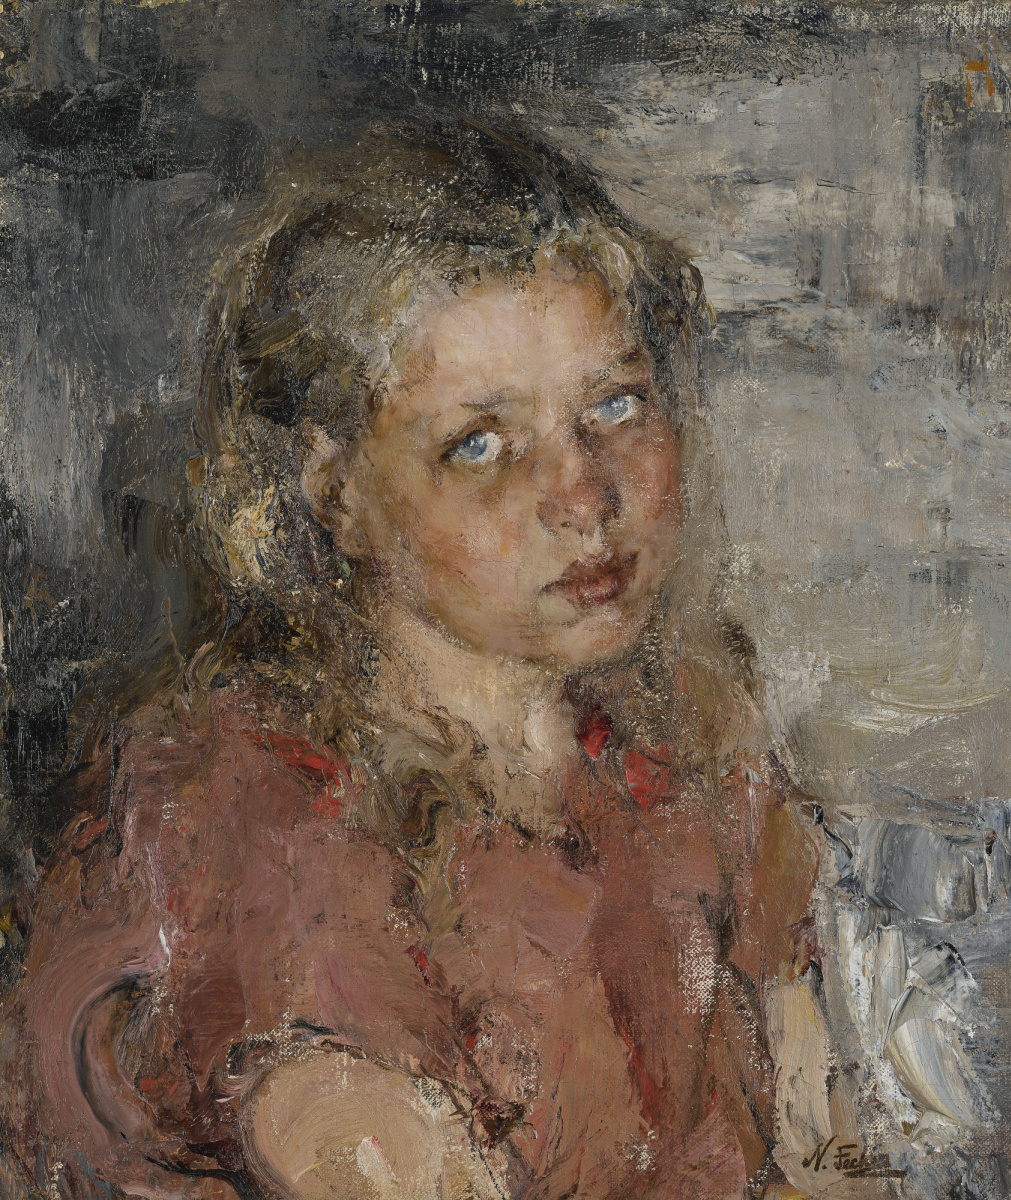 Nikolay Feshin. Portrait of a Young Girl